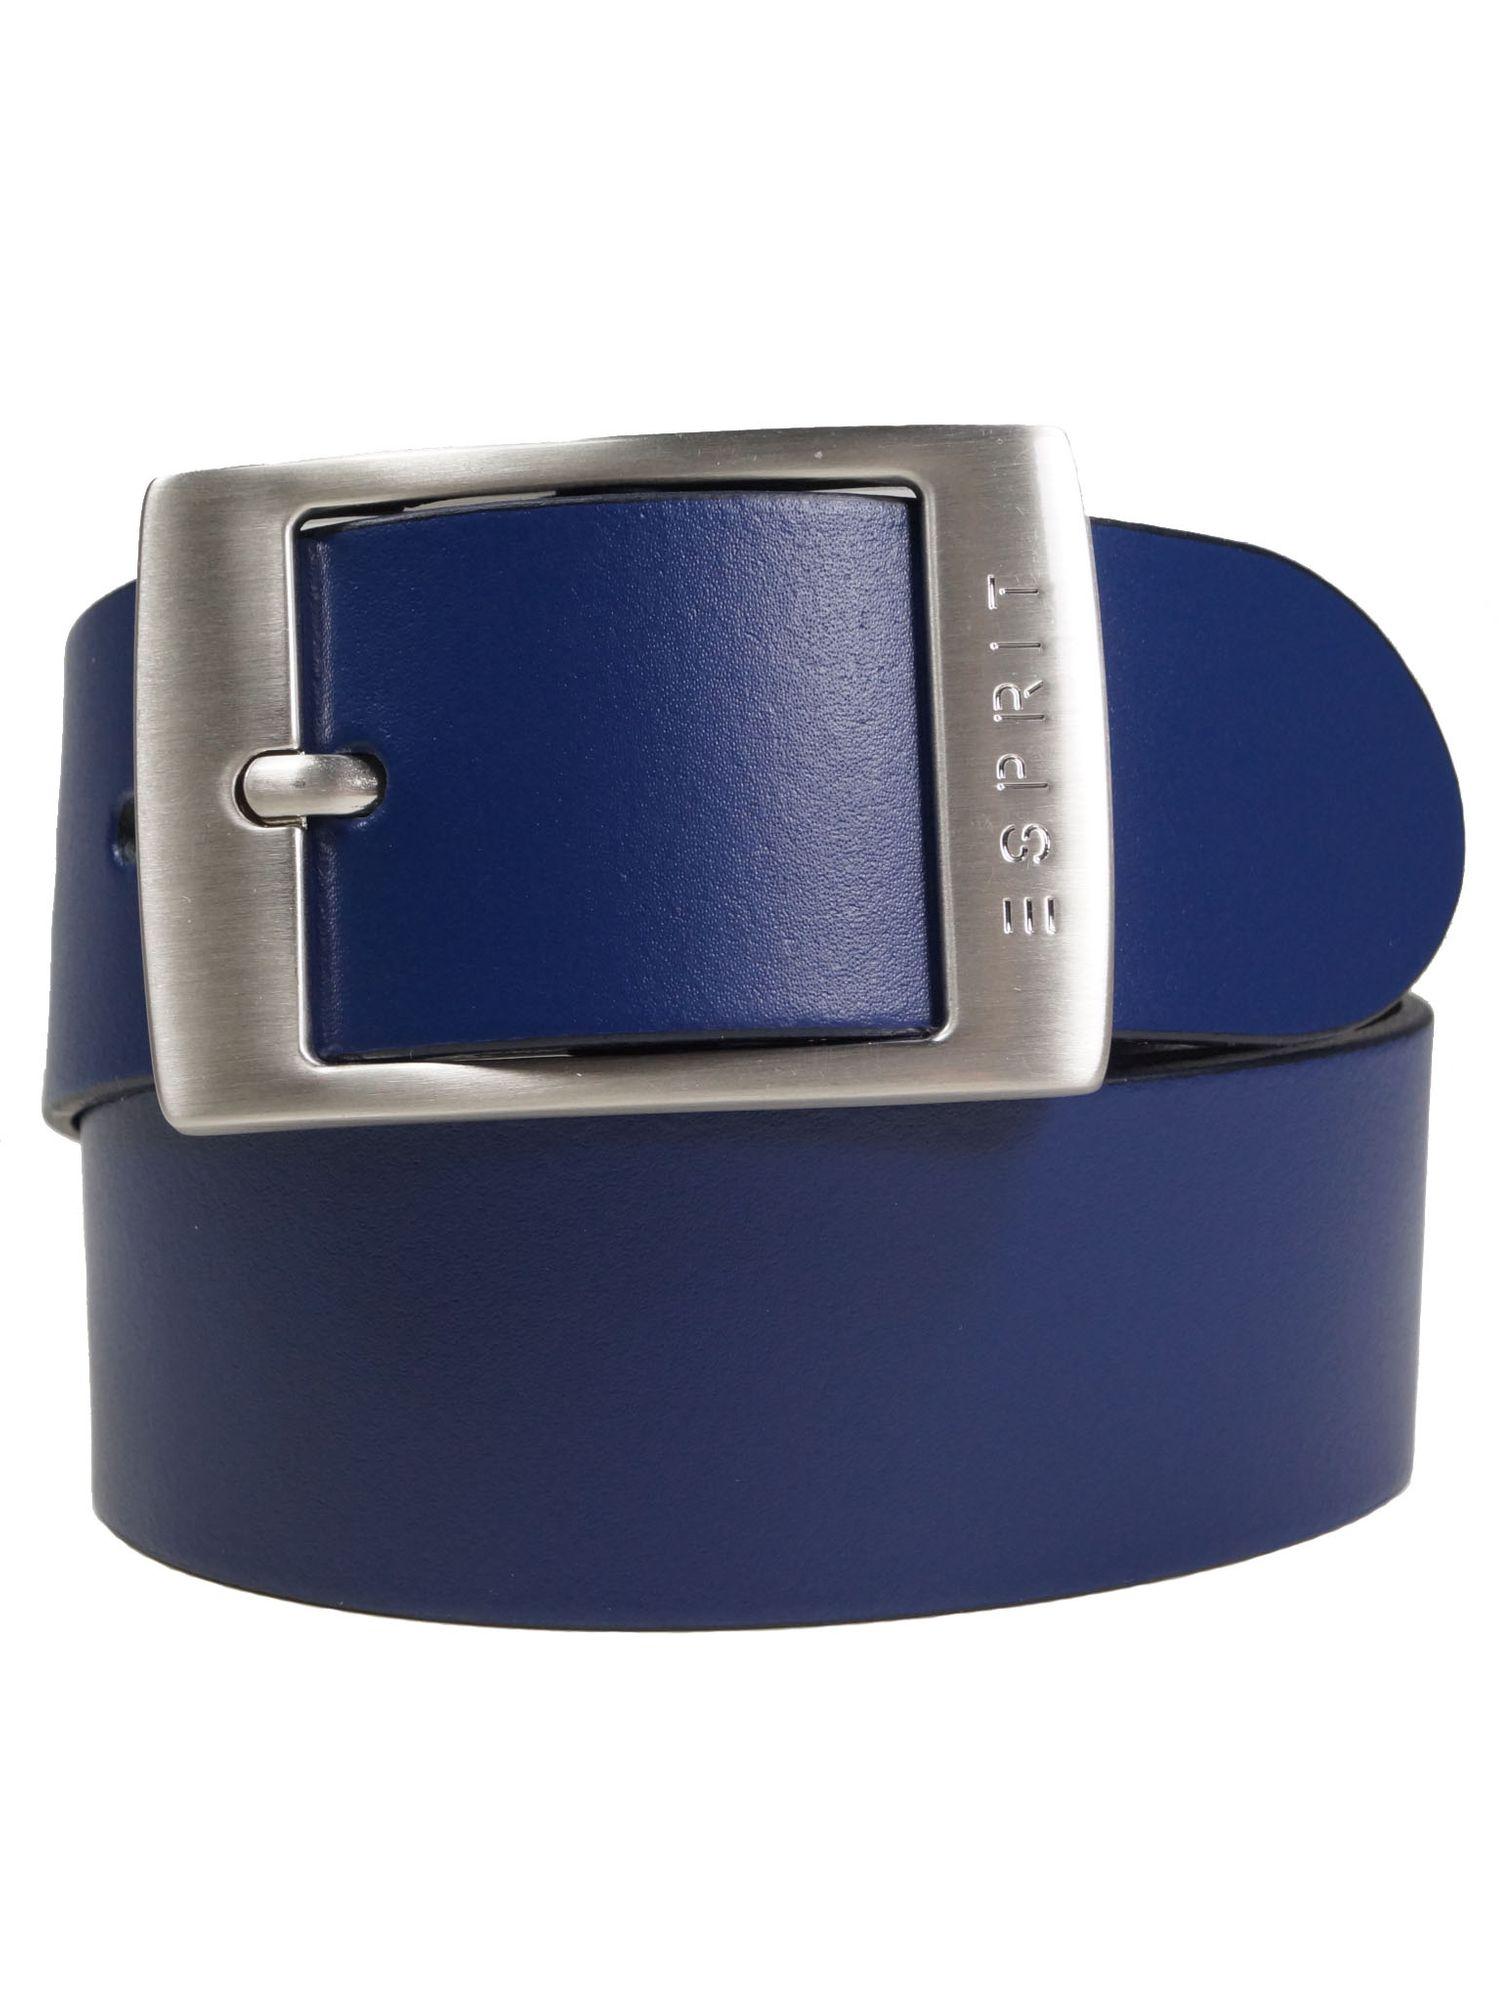 Esprit Damen Gürtel Jeansgürtel Xoctavia Leder 100cm Blau - Kaufen ... 9133b8f811